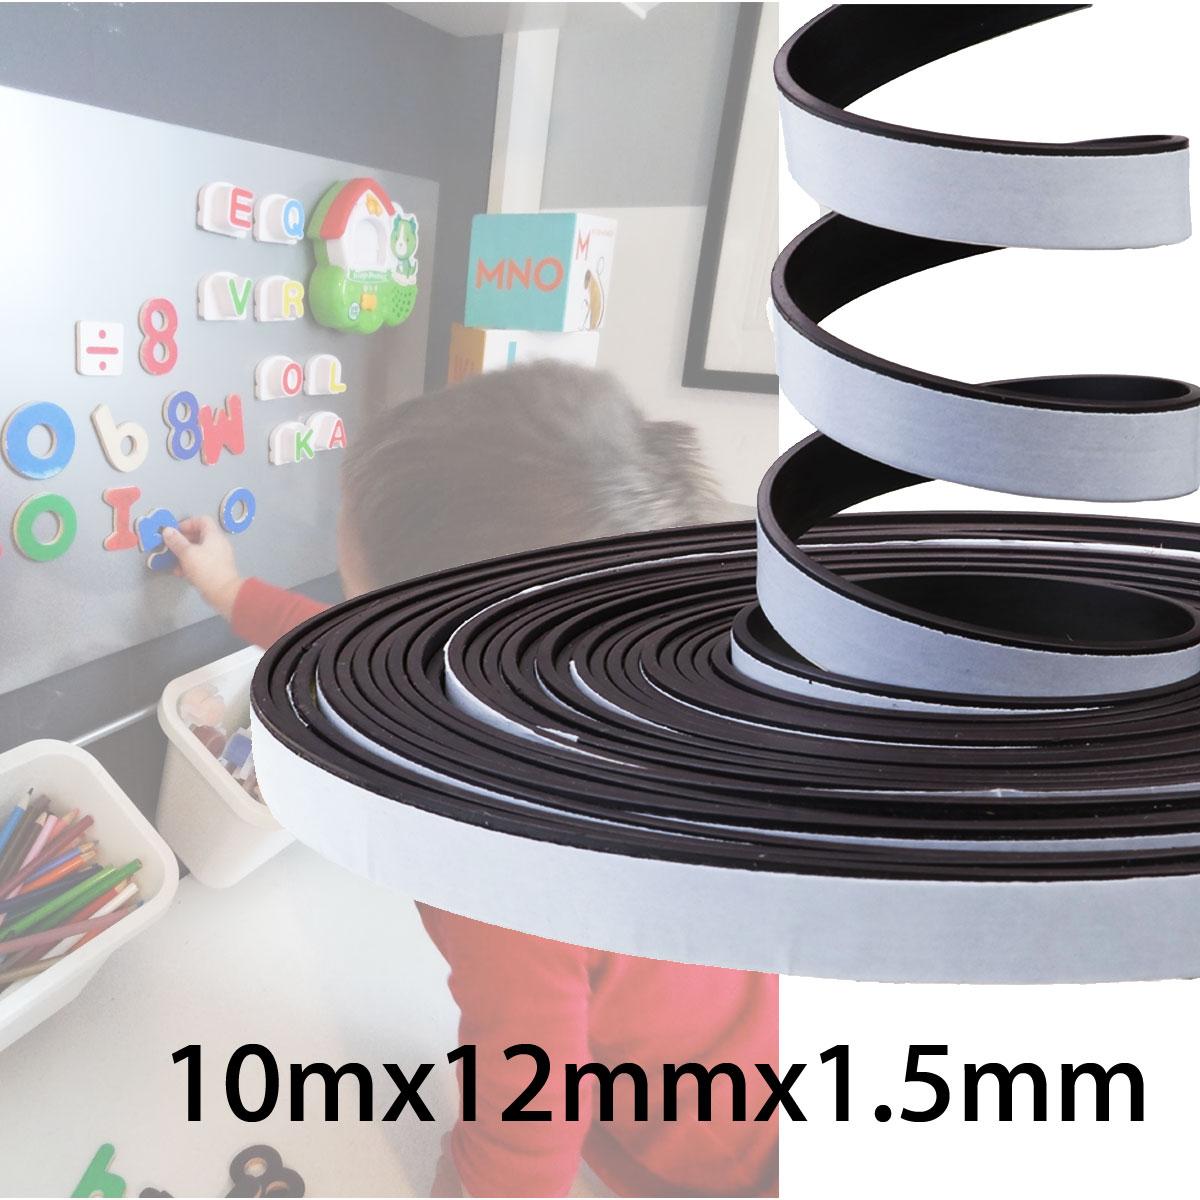 10M Self Adhesive Flexible Soft Rubber Magnetic Tape Blackboard Magnet DIY Strip 5pcs magnet sheet a4 thickness 1mm rubber magnetic strip tape flexible magnet diy craft tape